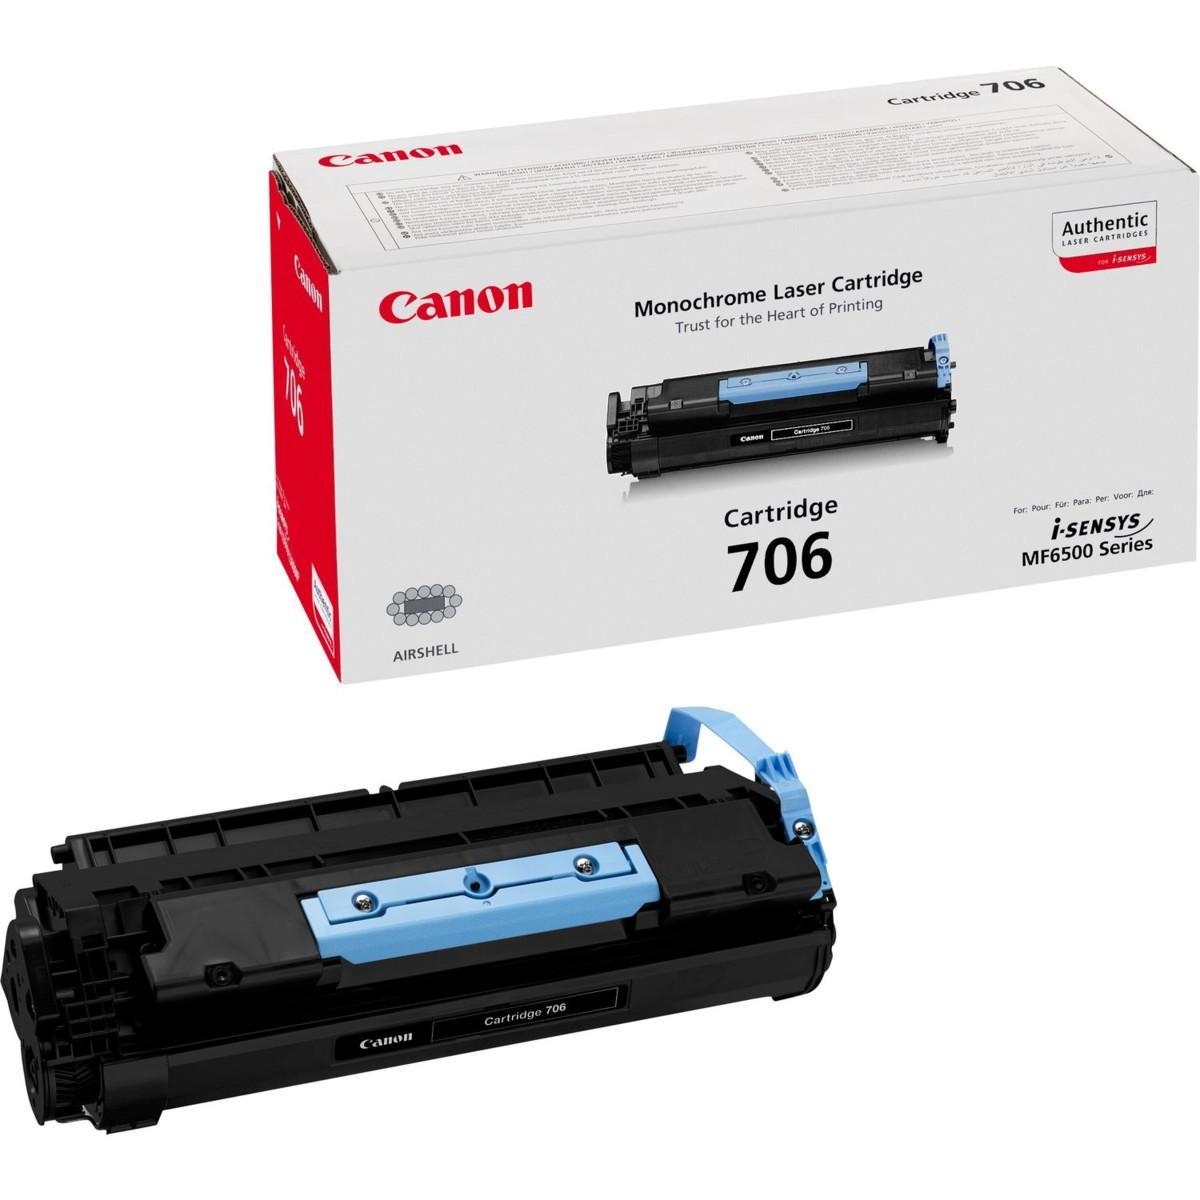 Toner Canon 706, CRG-706, 0264B002 - originálný (Čierny)